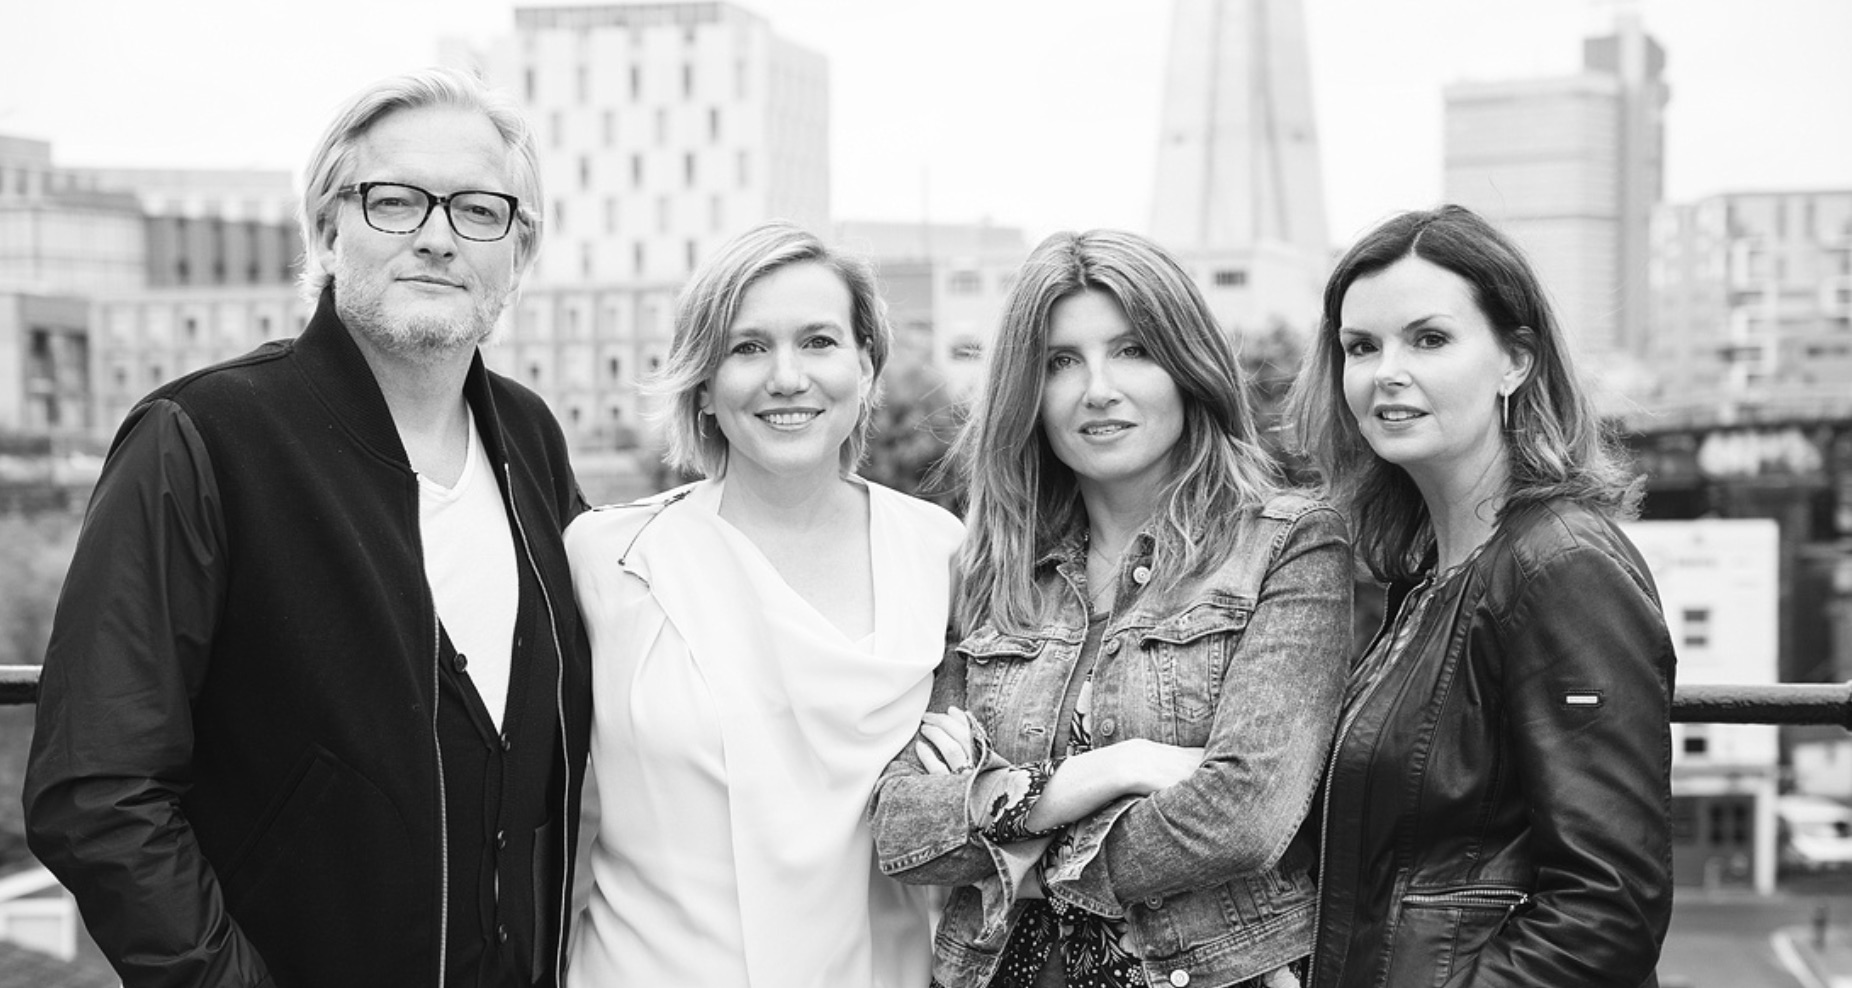 Pictured from left: Jeremy Rainbird, Kira Carstensen, Sharon Horgan, Clelia Mountford